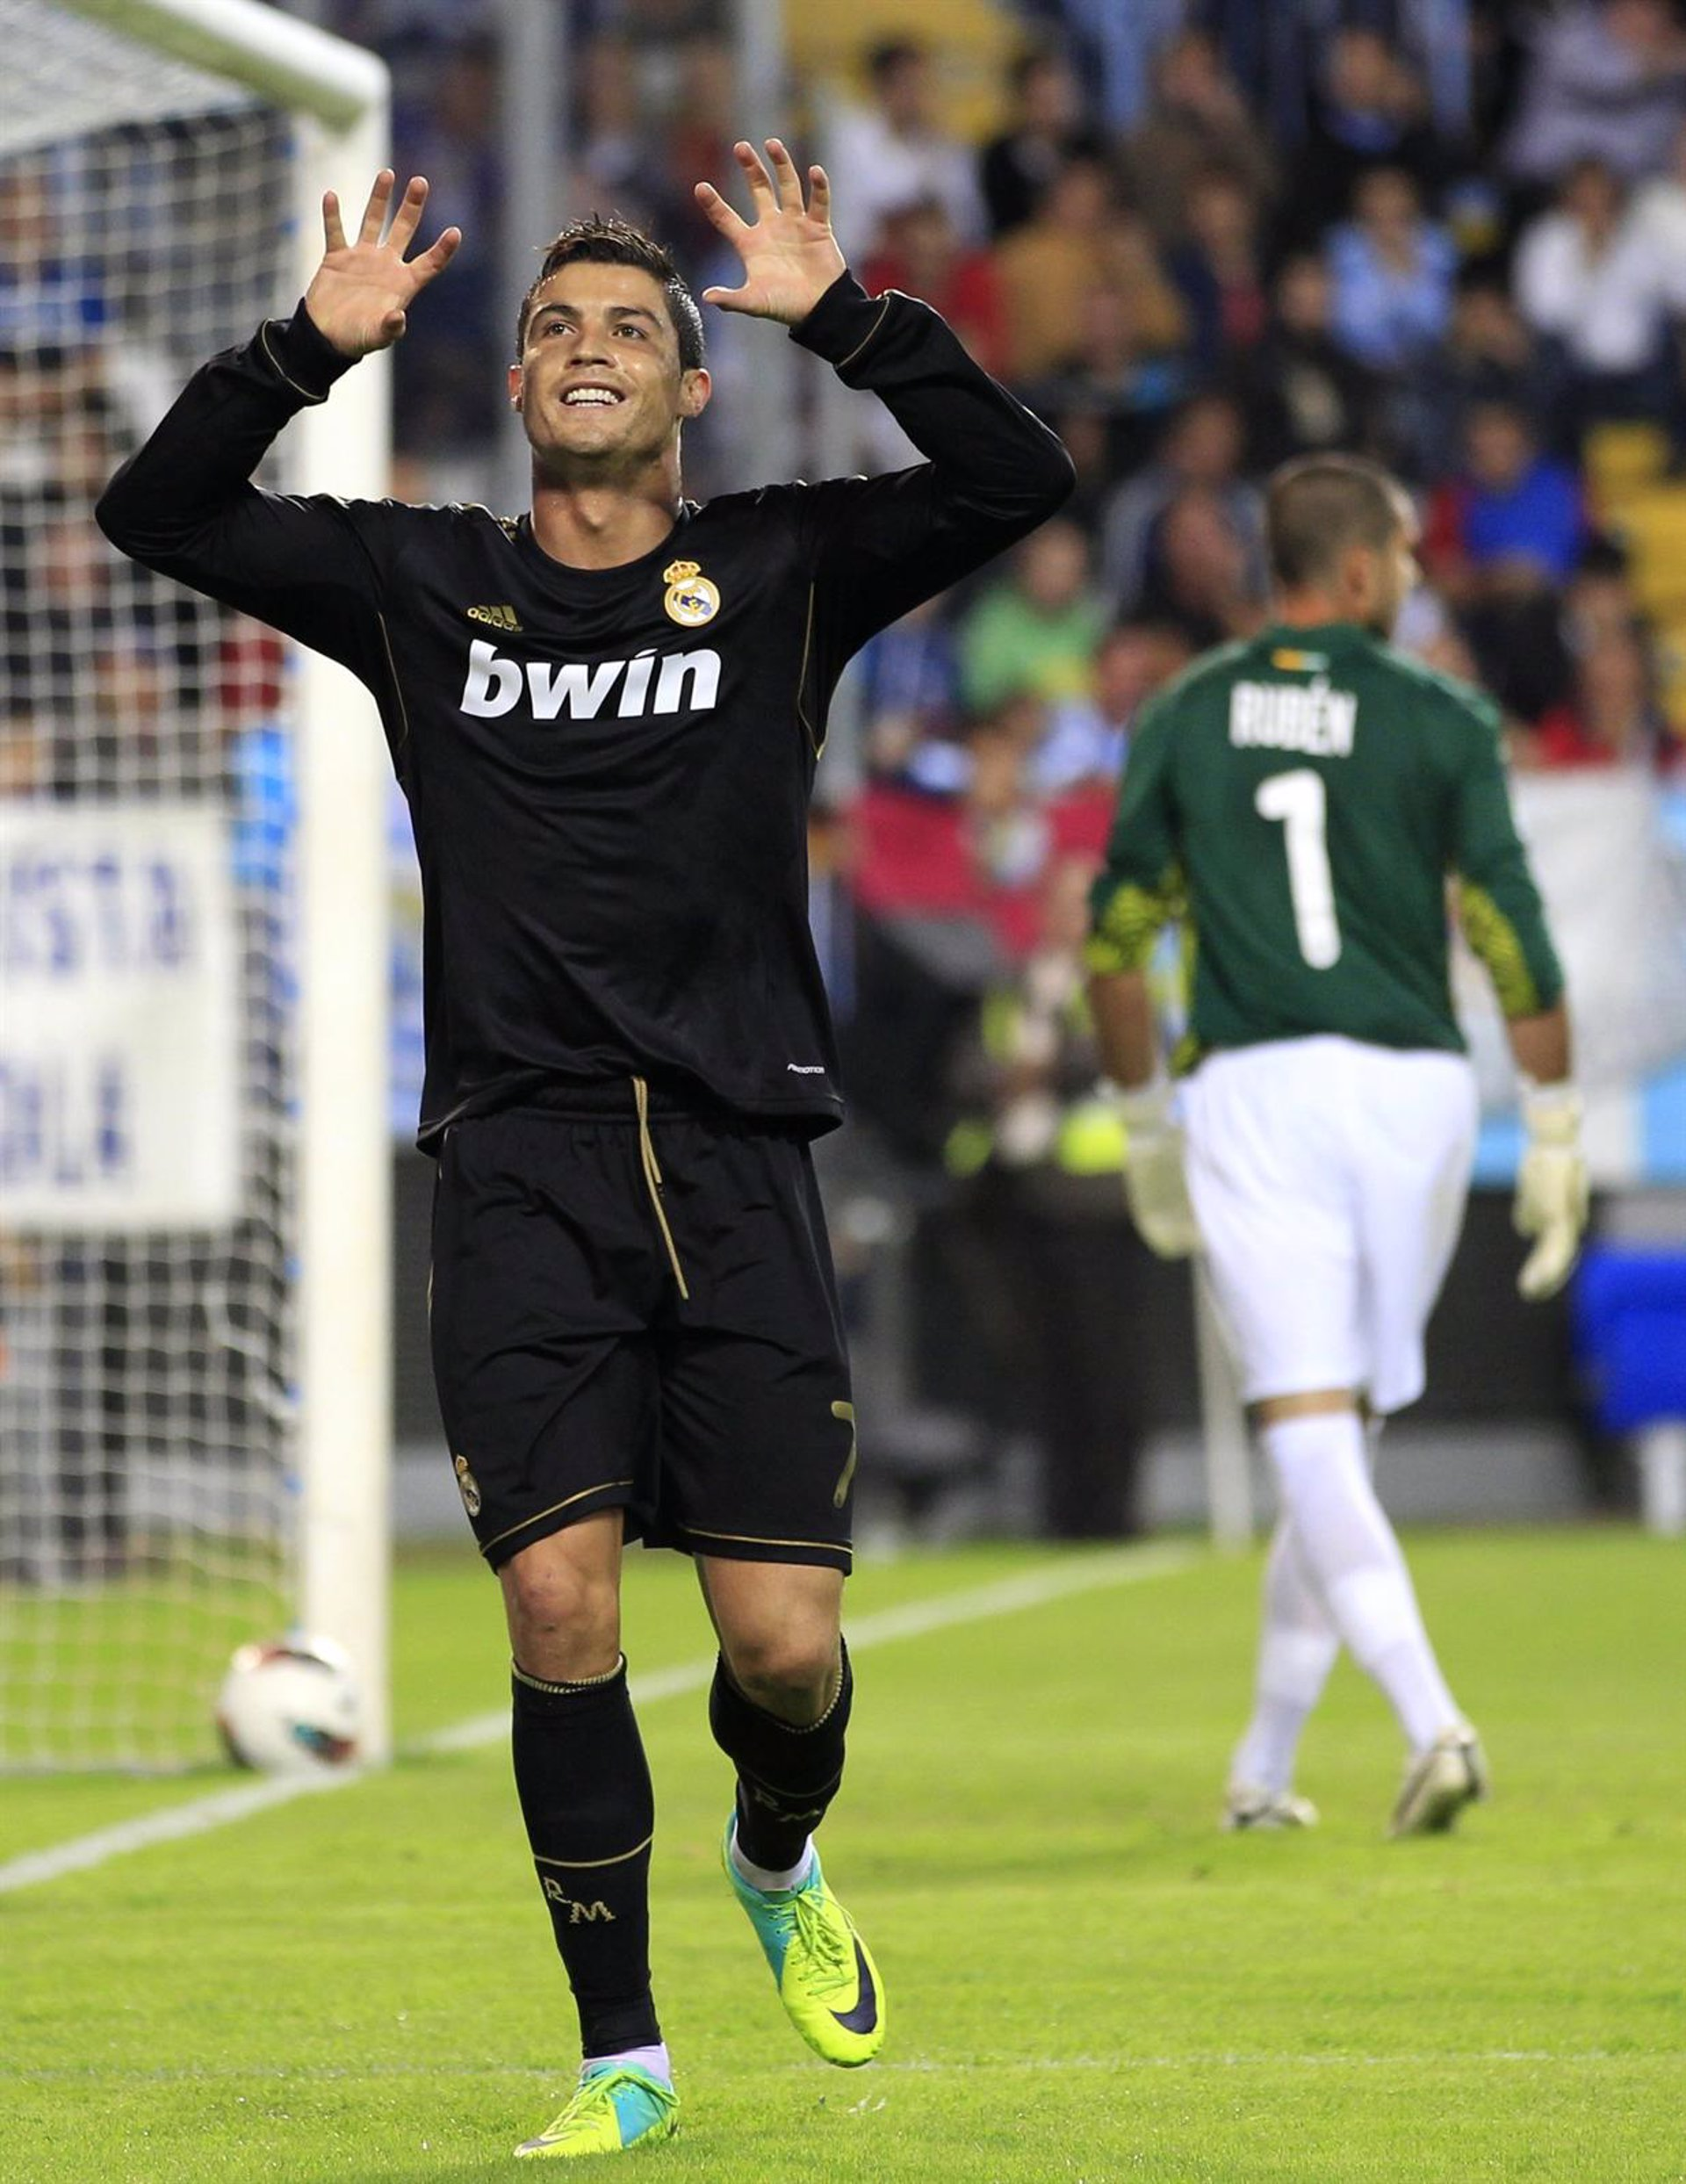 Fútbol/Liga BBVA. Crónica del Málaga 4 Real Madrid, 0 4 Málaga a5df6f